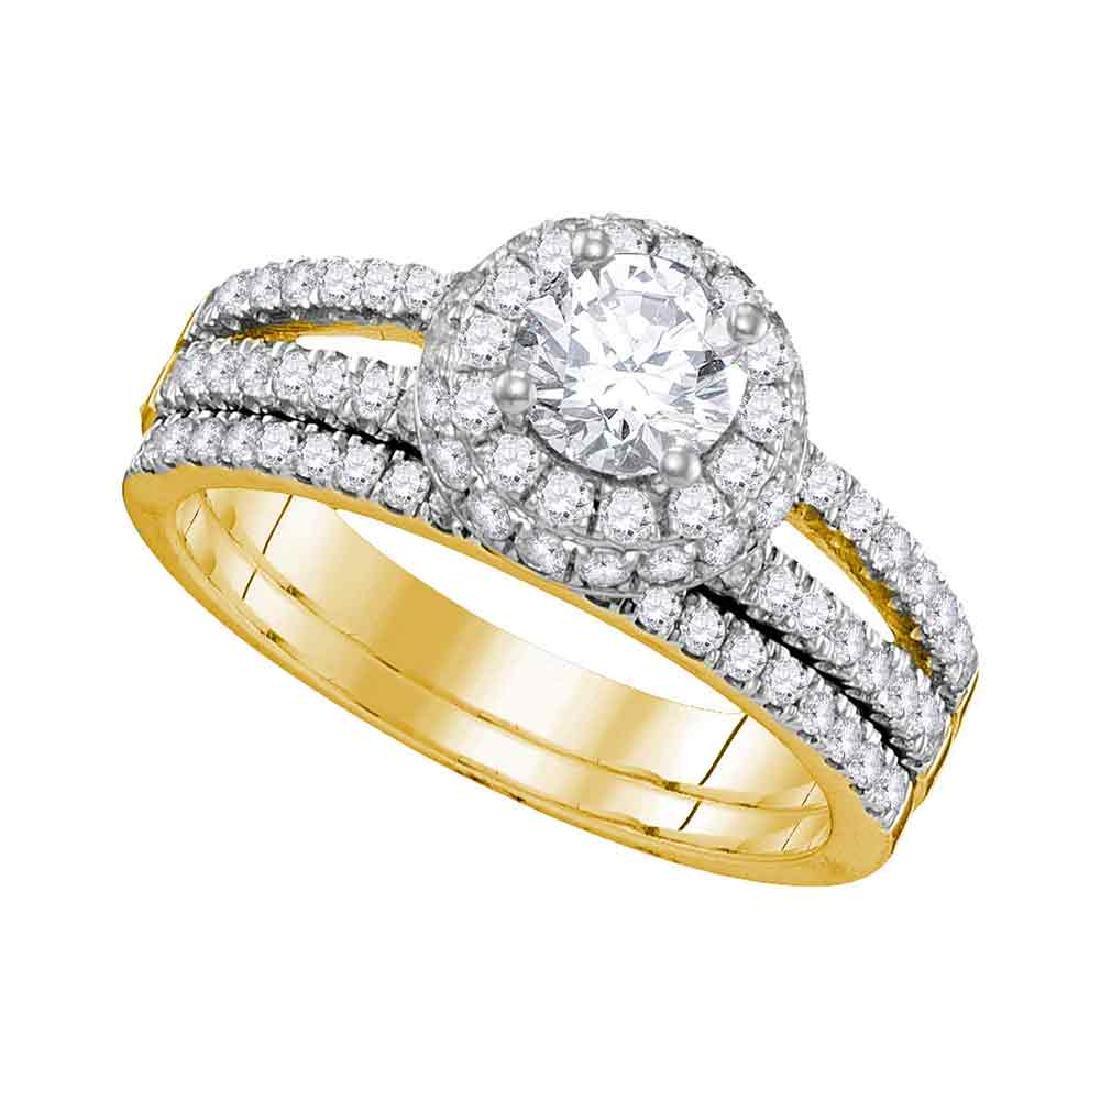 1.5 CTW Diamond Halo Bridal Engagement Ring 14KT Yellow